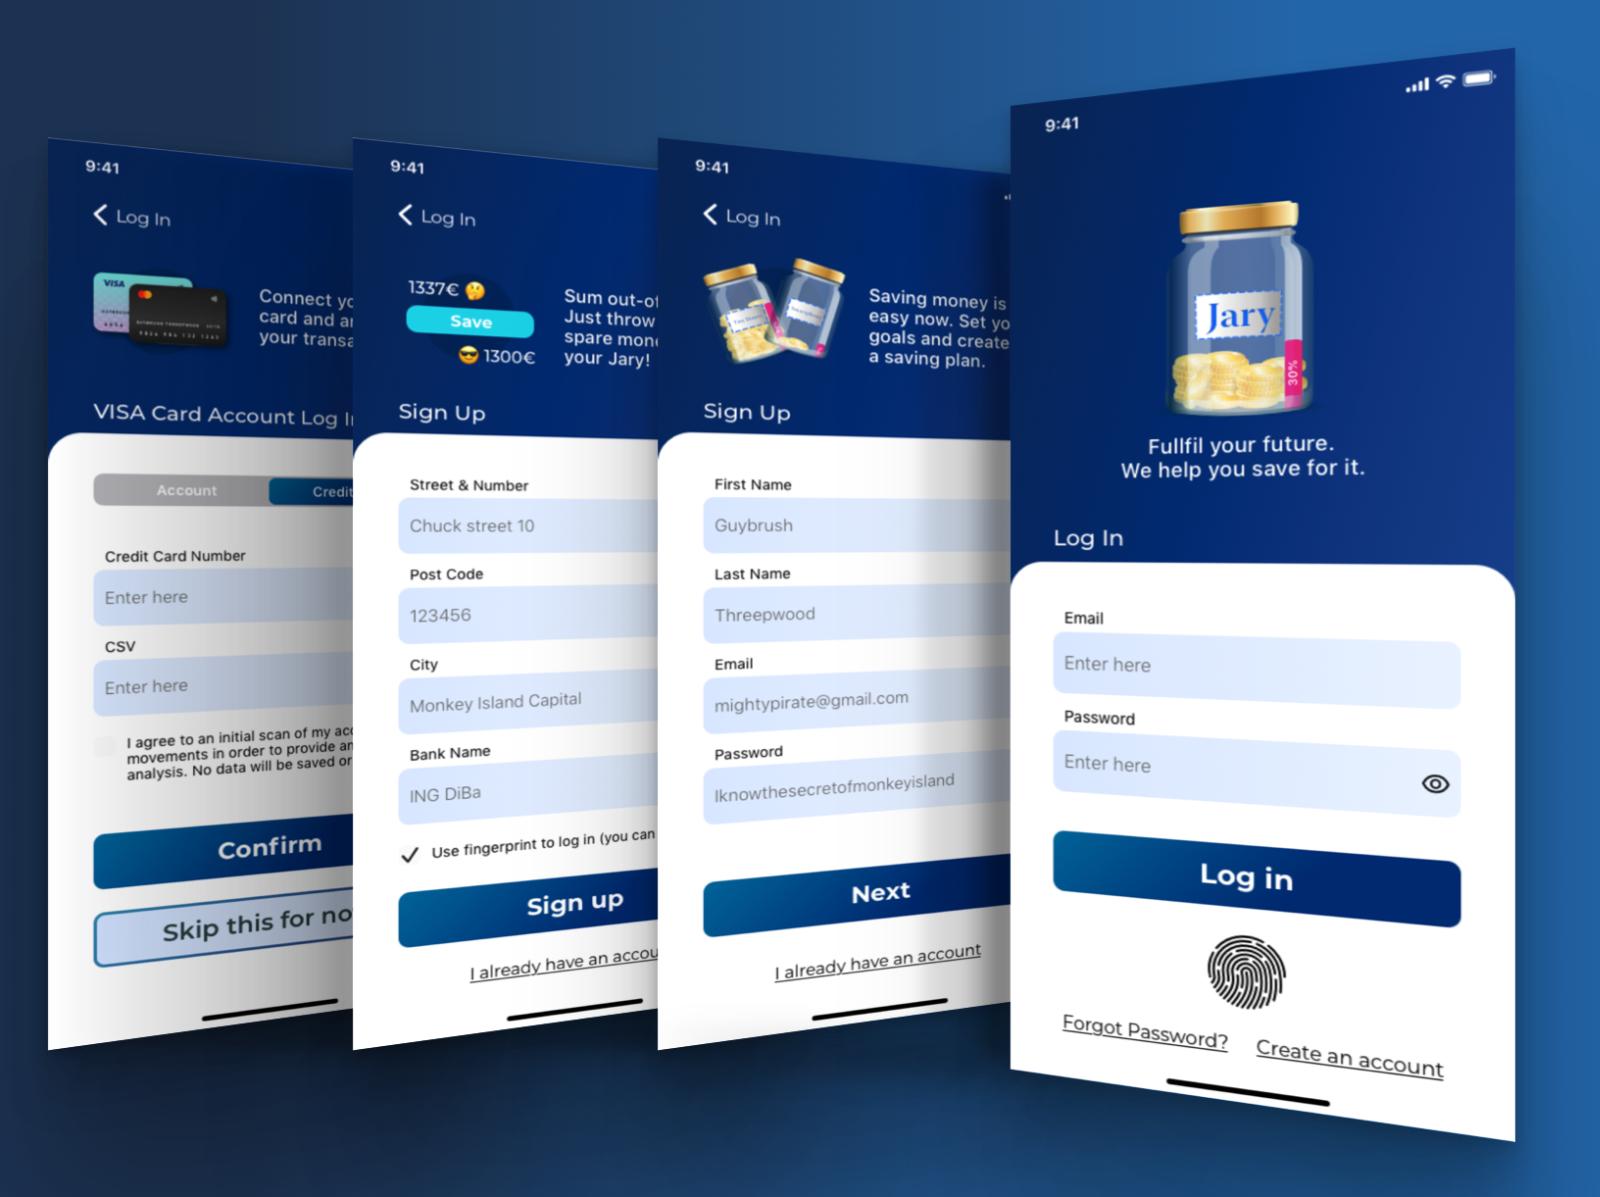 Money Saving App Ios Onboarding Log In Jary By Andrej Olsen On Dribbble